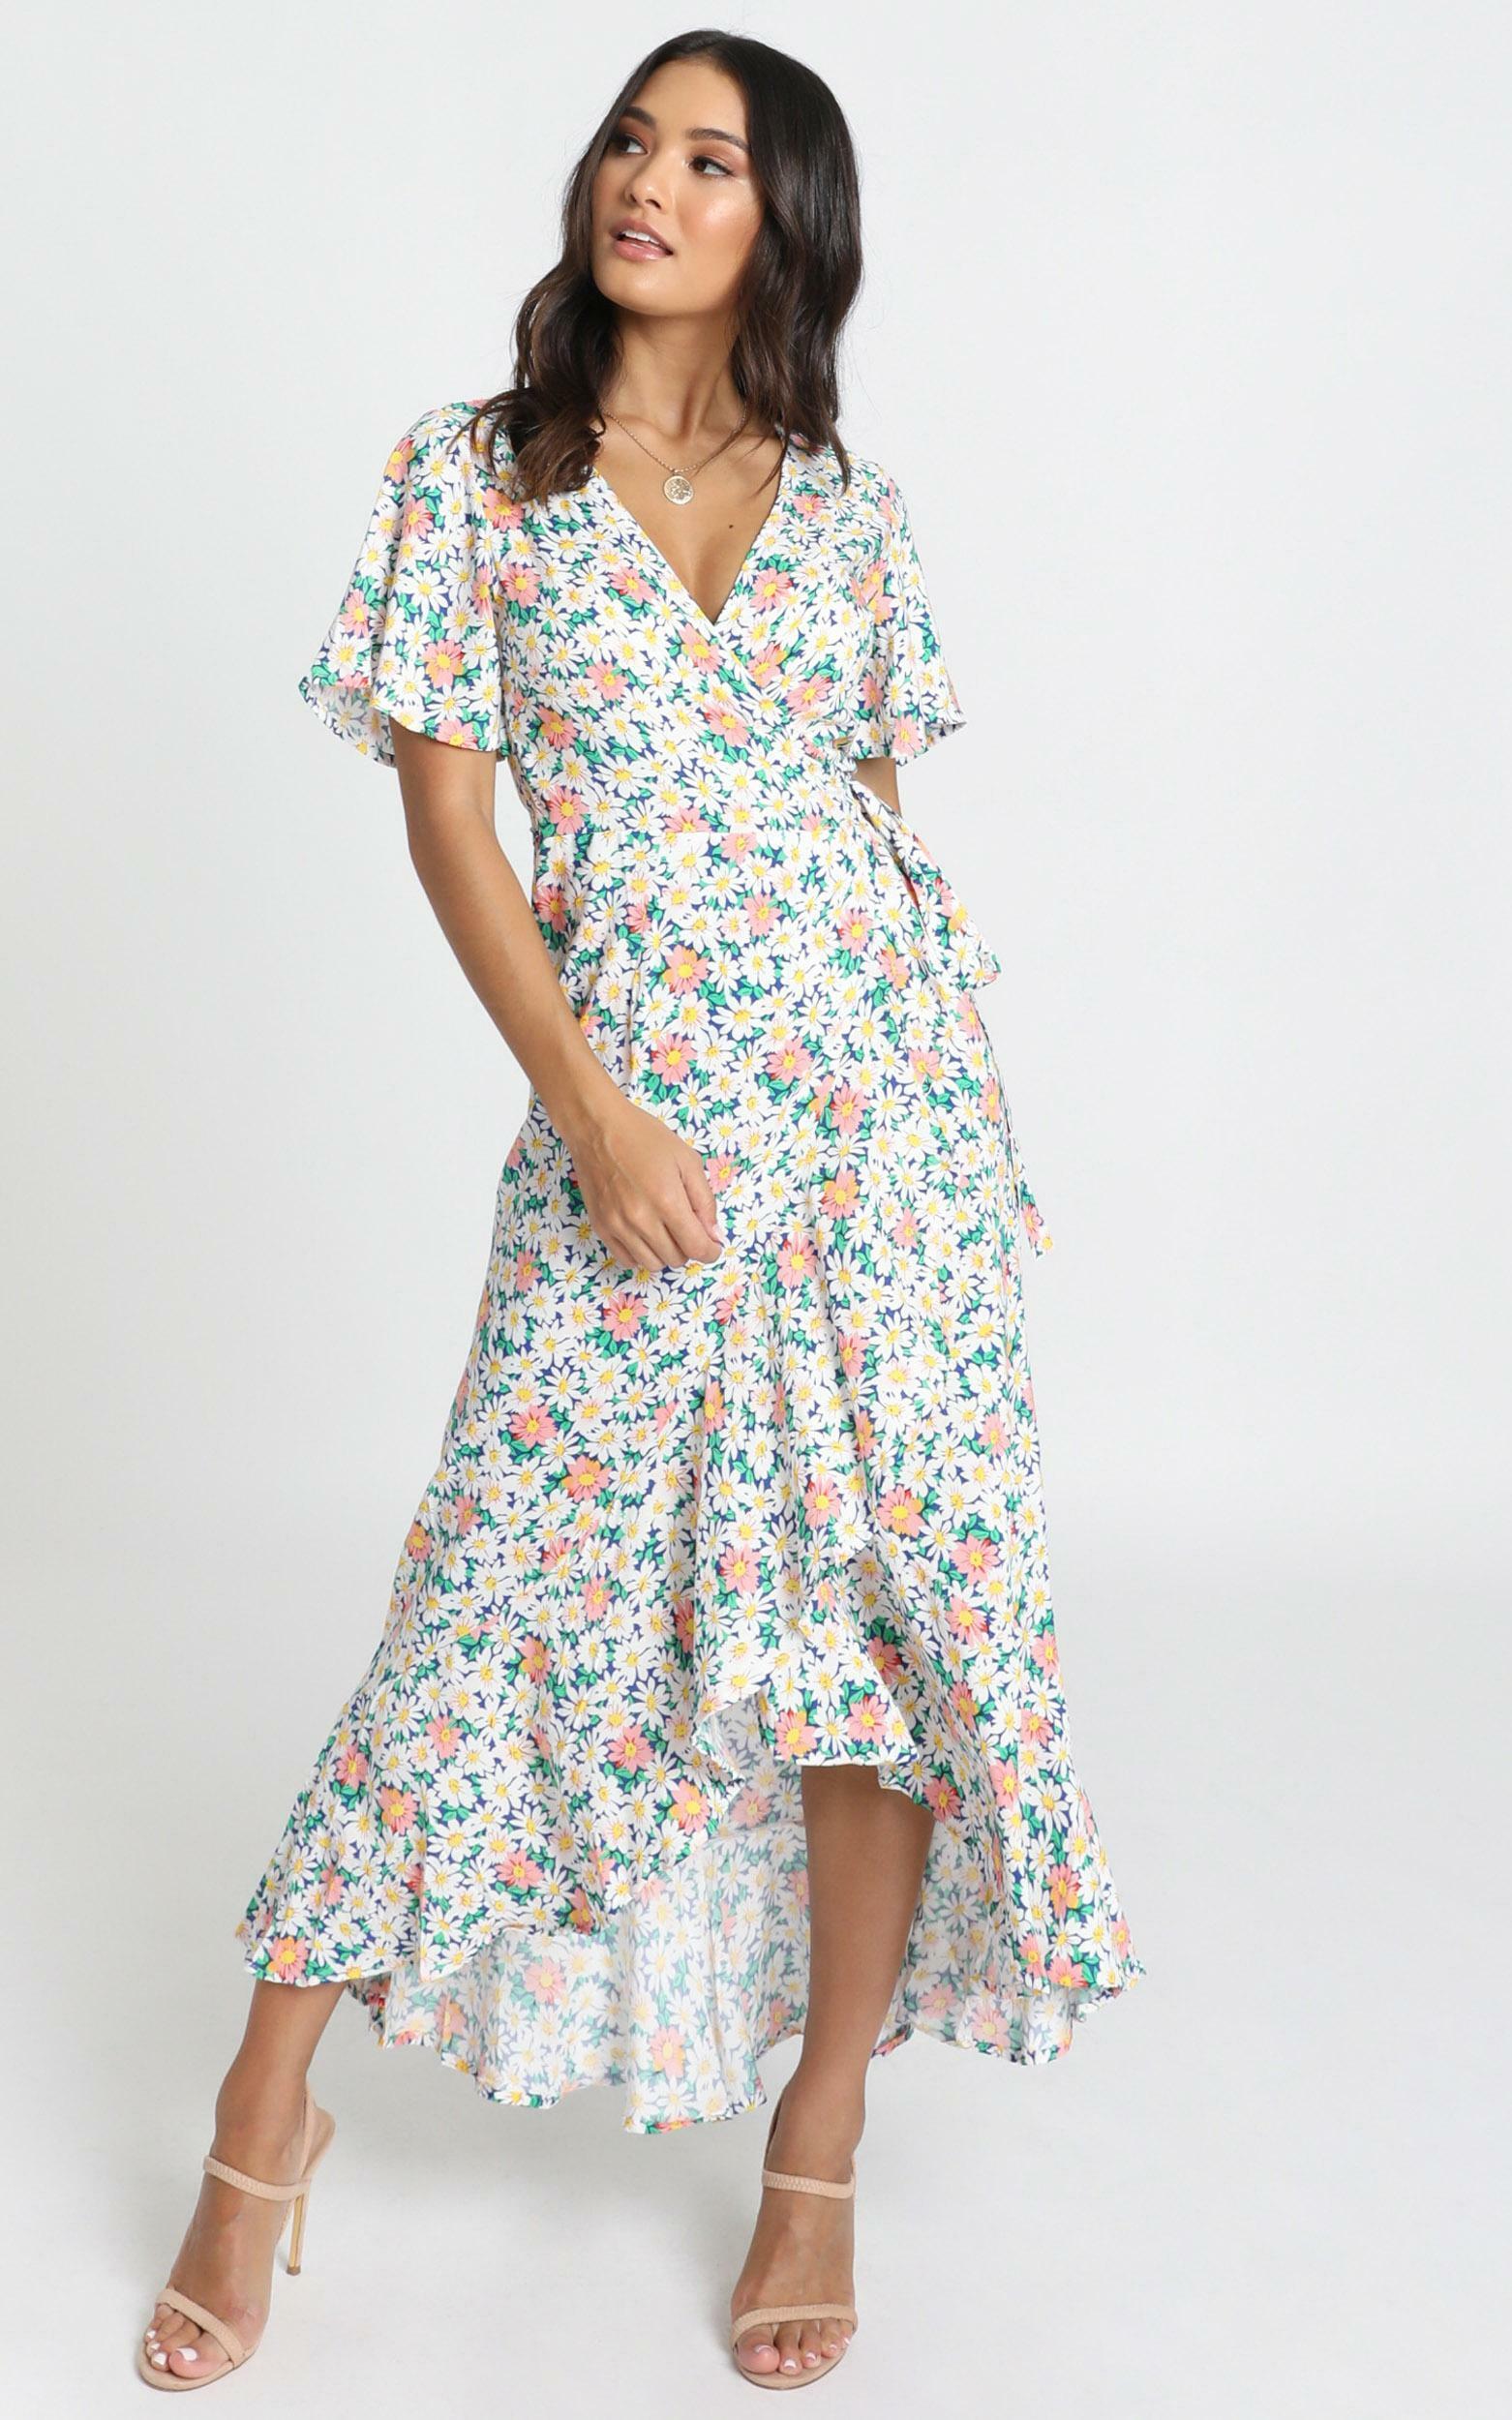 Lavish Life Dress in multi floral - 6 (XS), Green, hi-res image number null